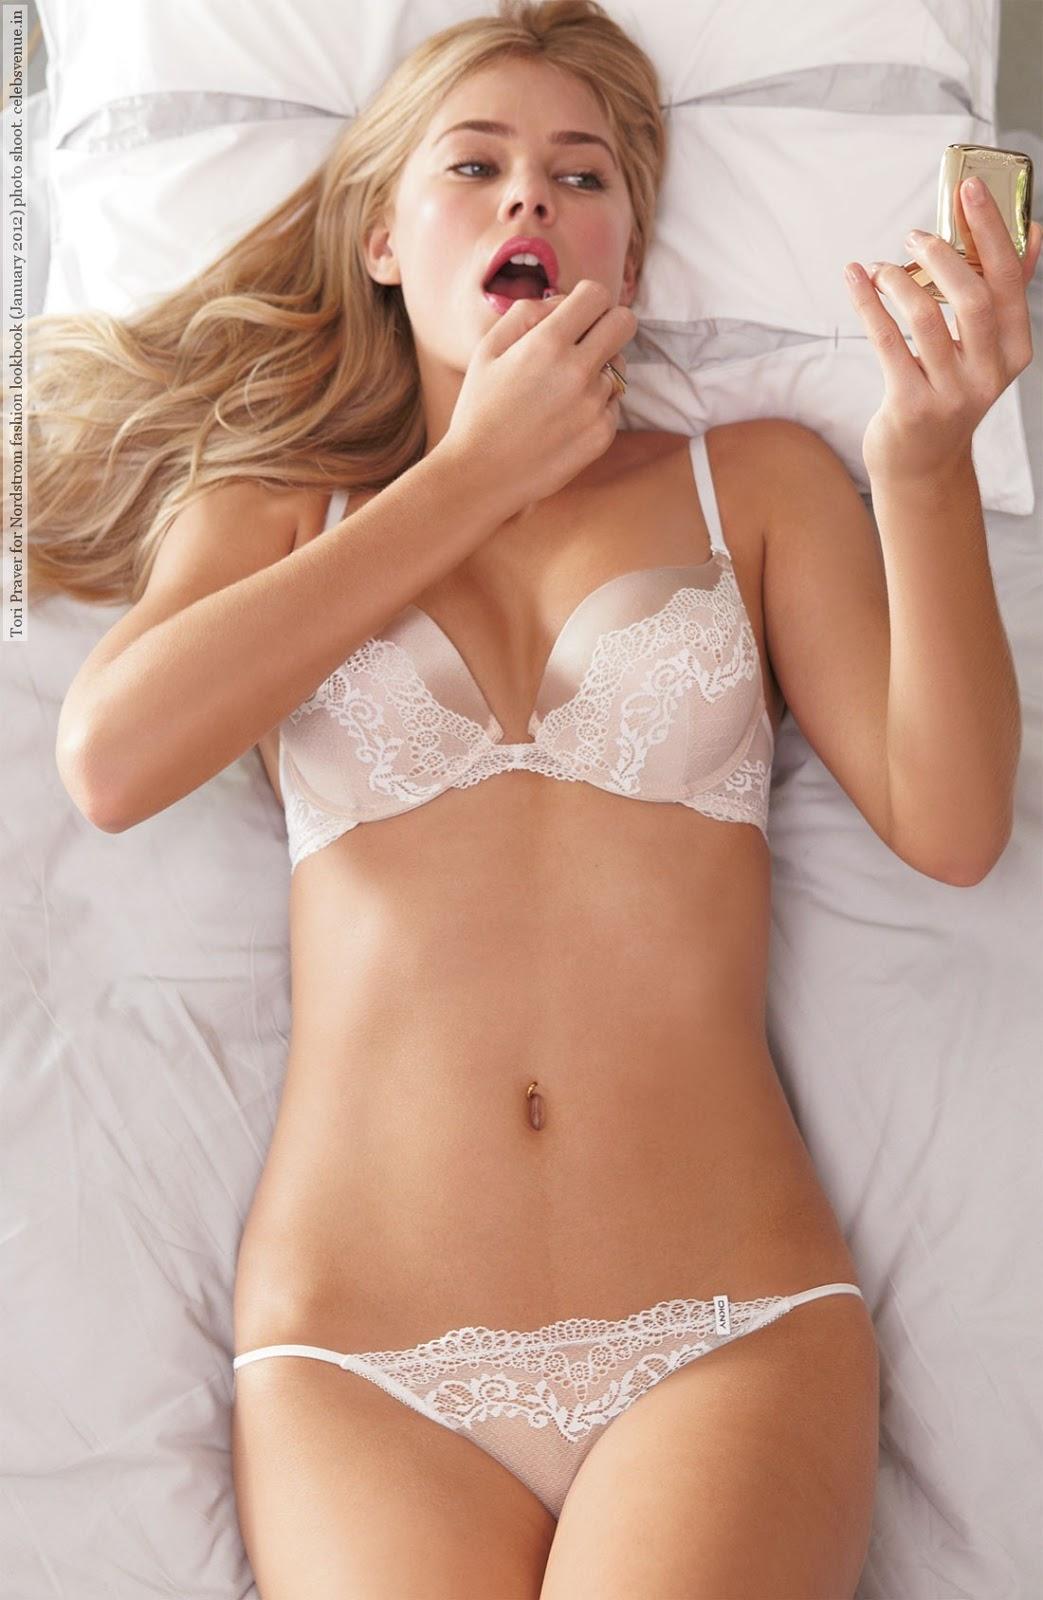 Tori Praver nudes (31 foto and video), Ass, Sideboobs, Boobs, braless 2018